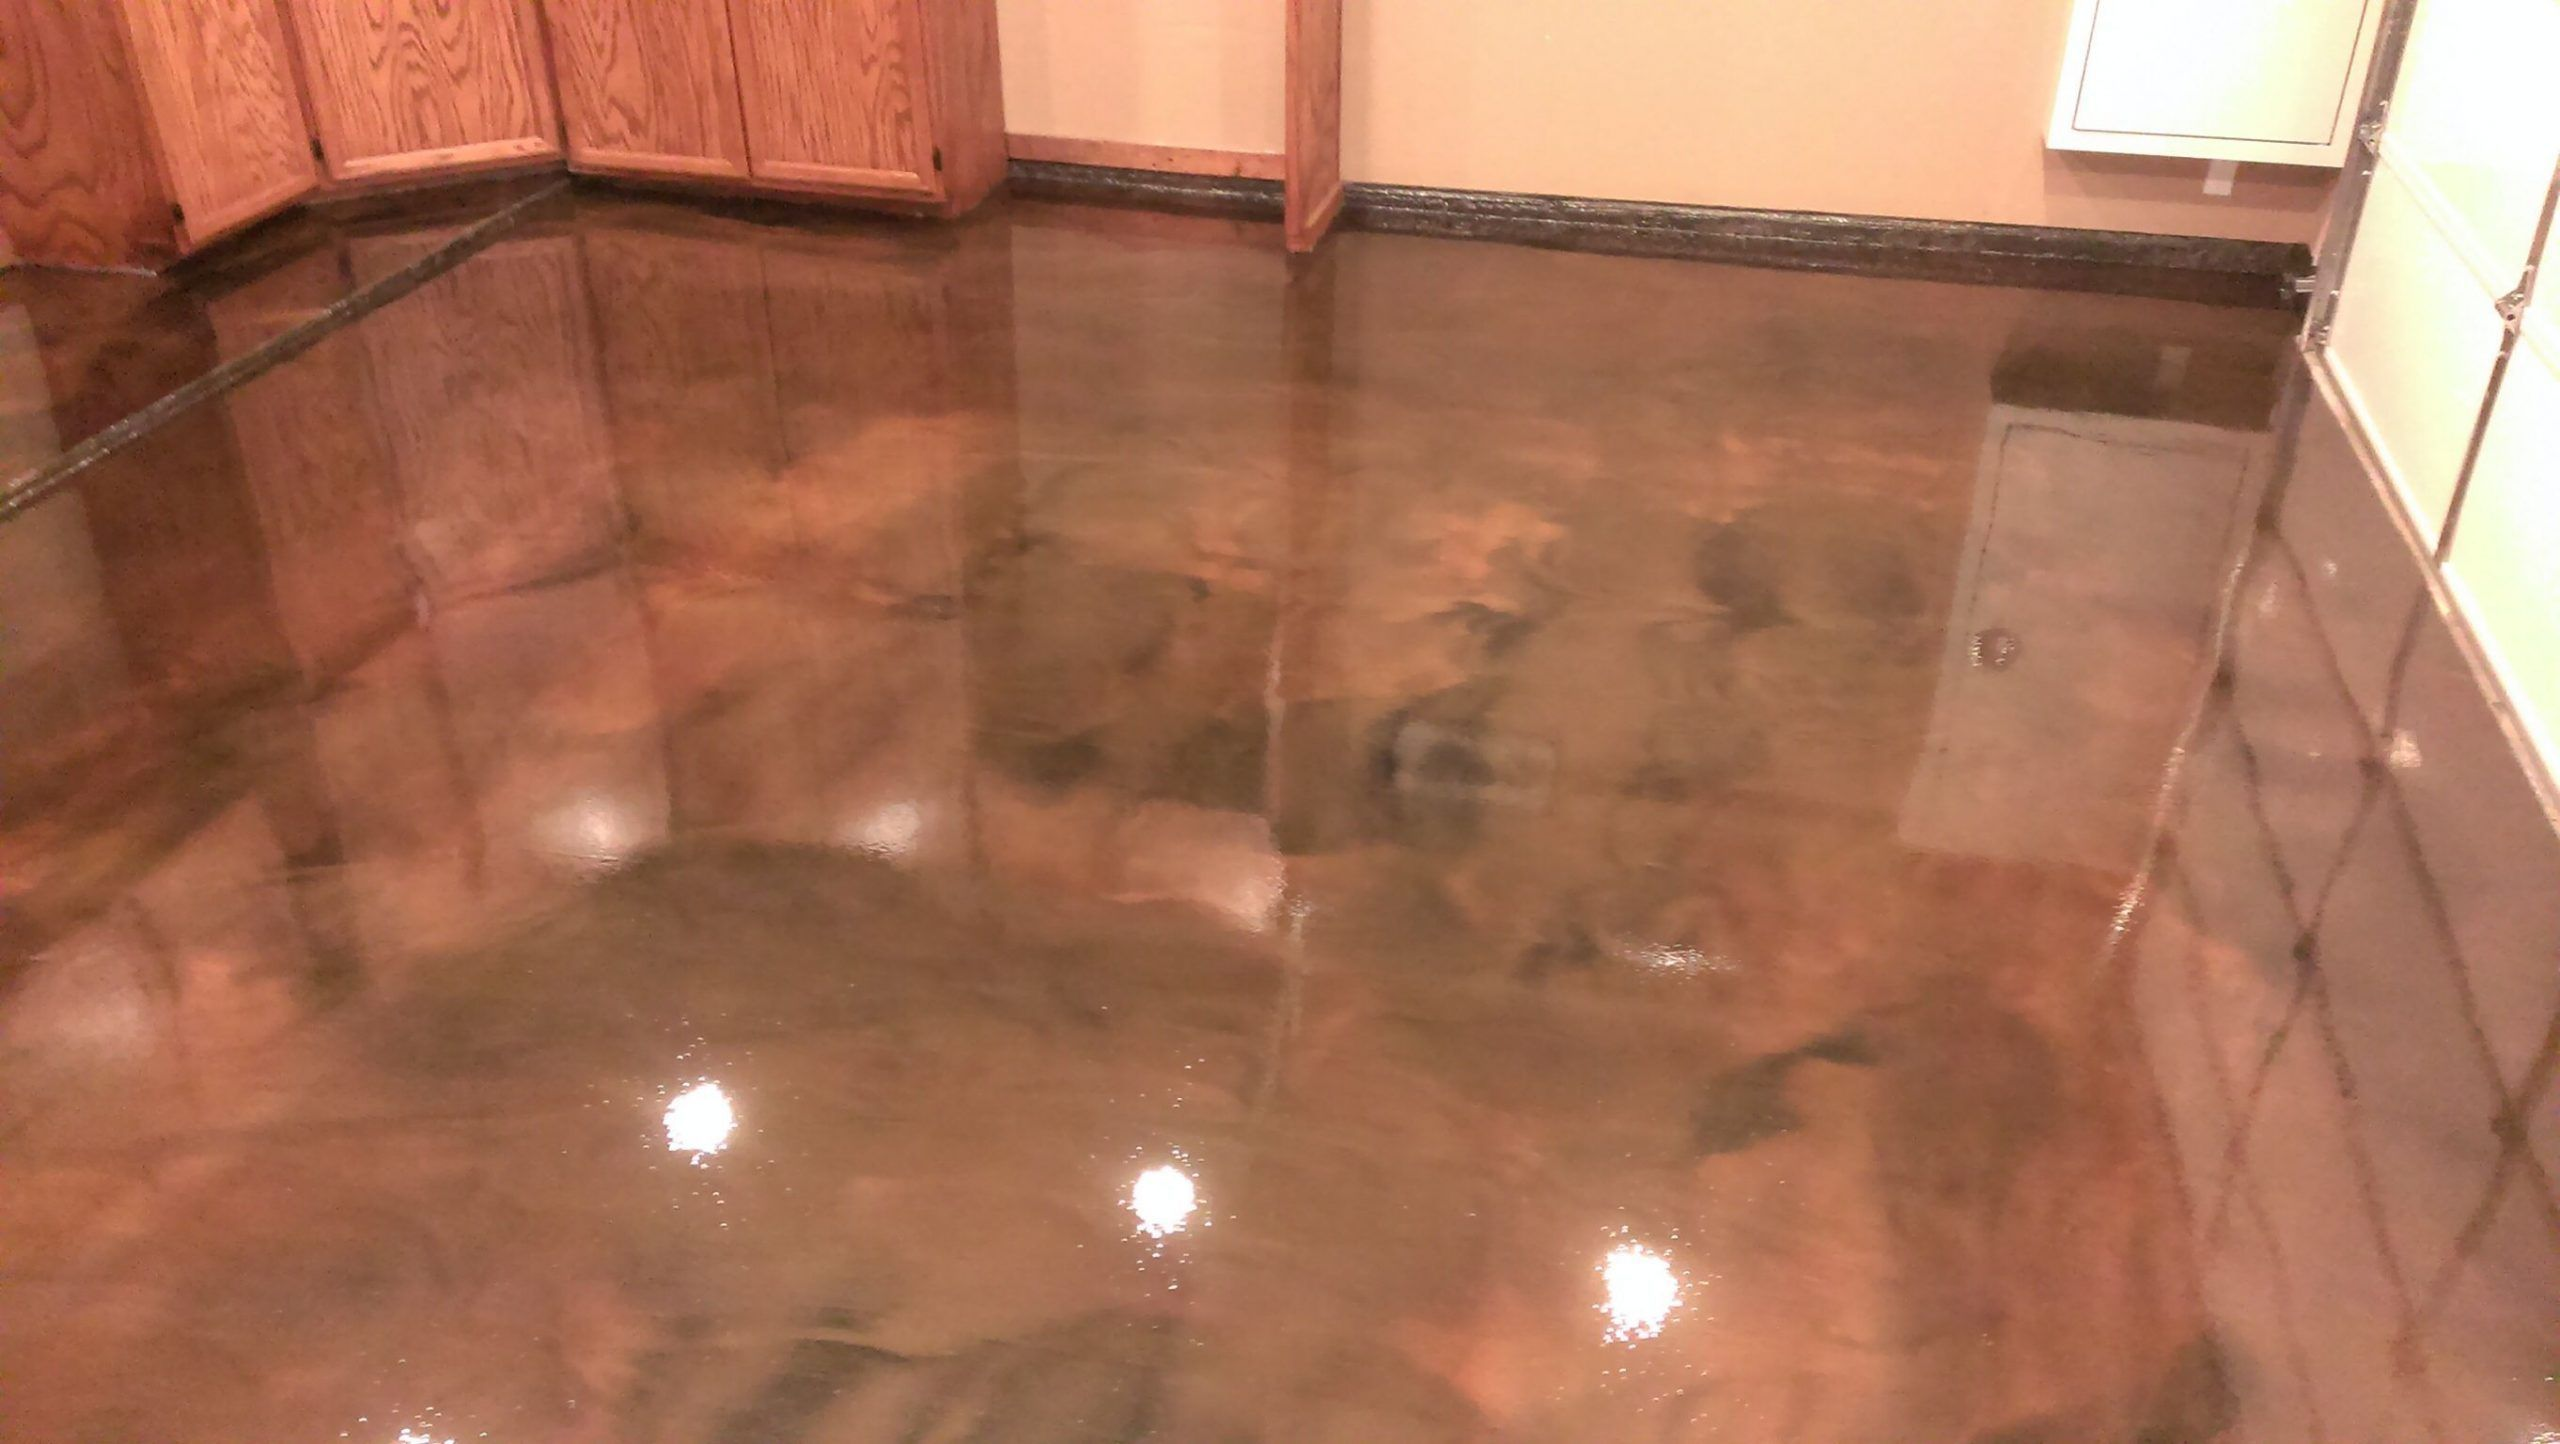 Metallic epoxy floor coating for a truly one of a kind floor finish#coating #ép...#coating #ép #epoxy #finishcoating #floor #kind #metallic